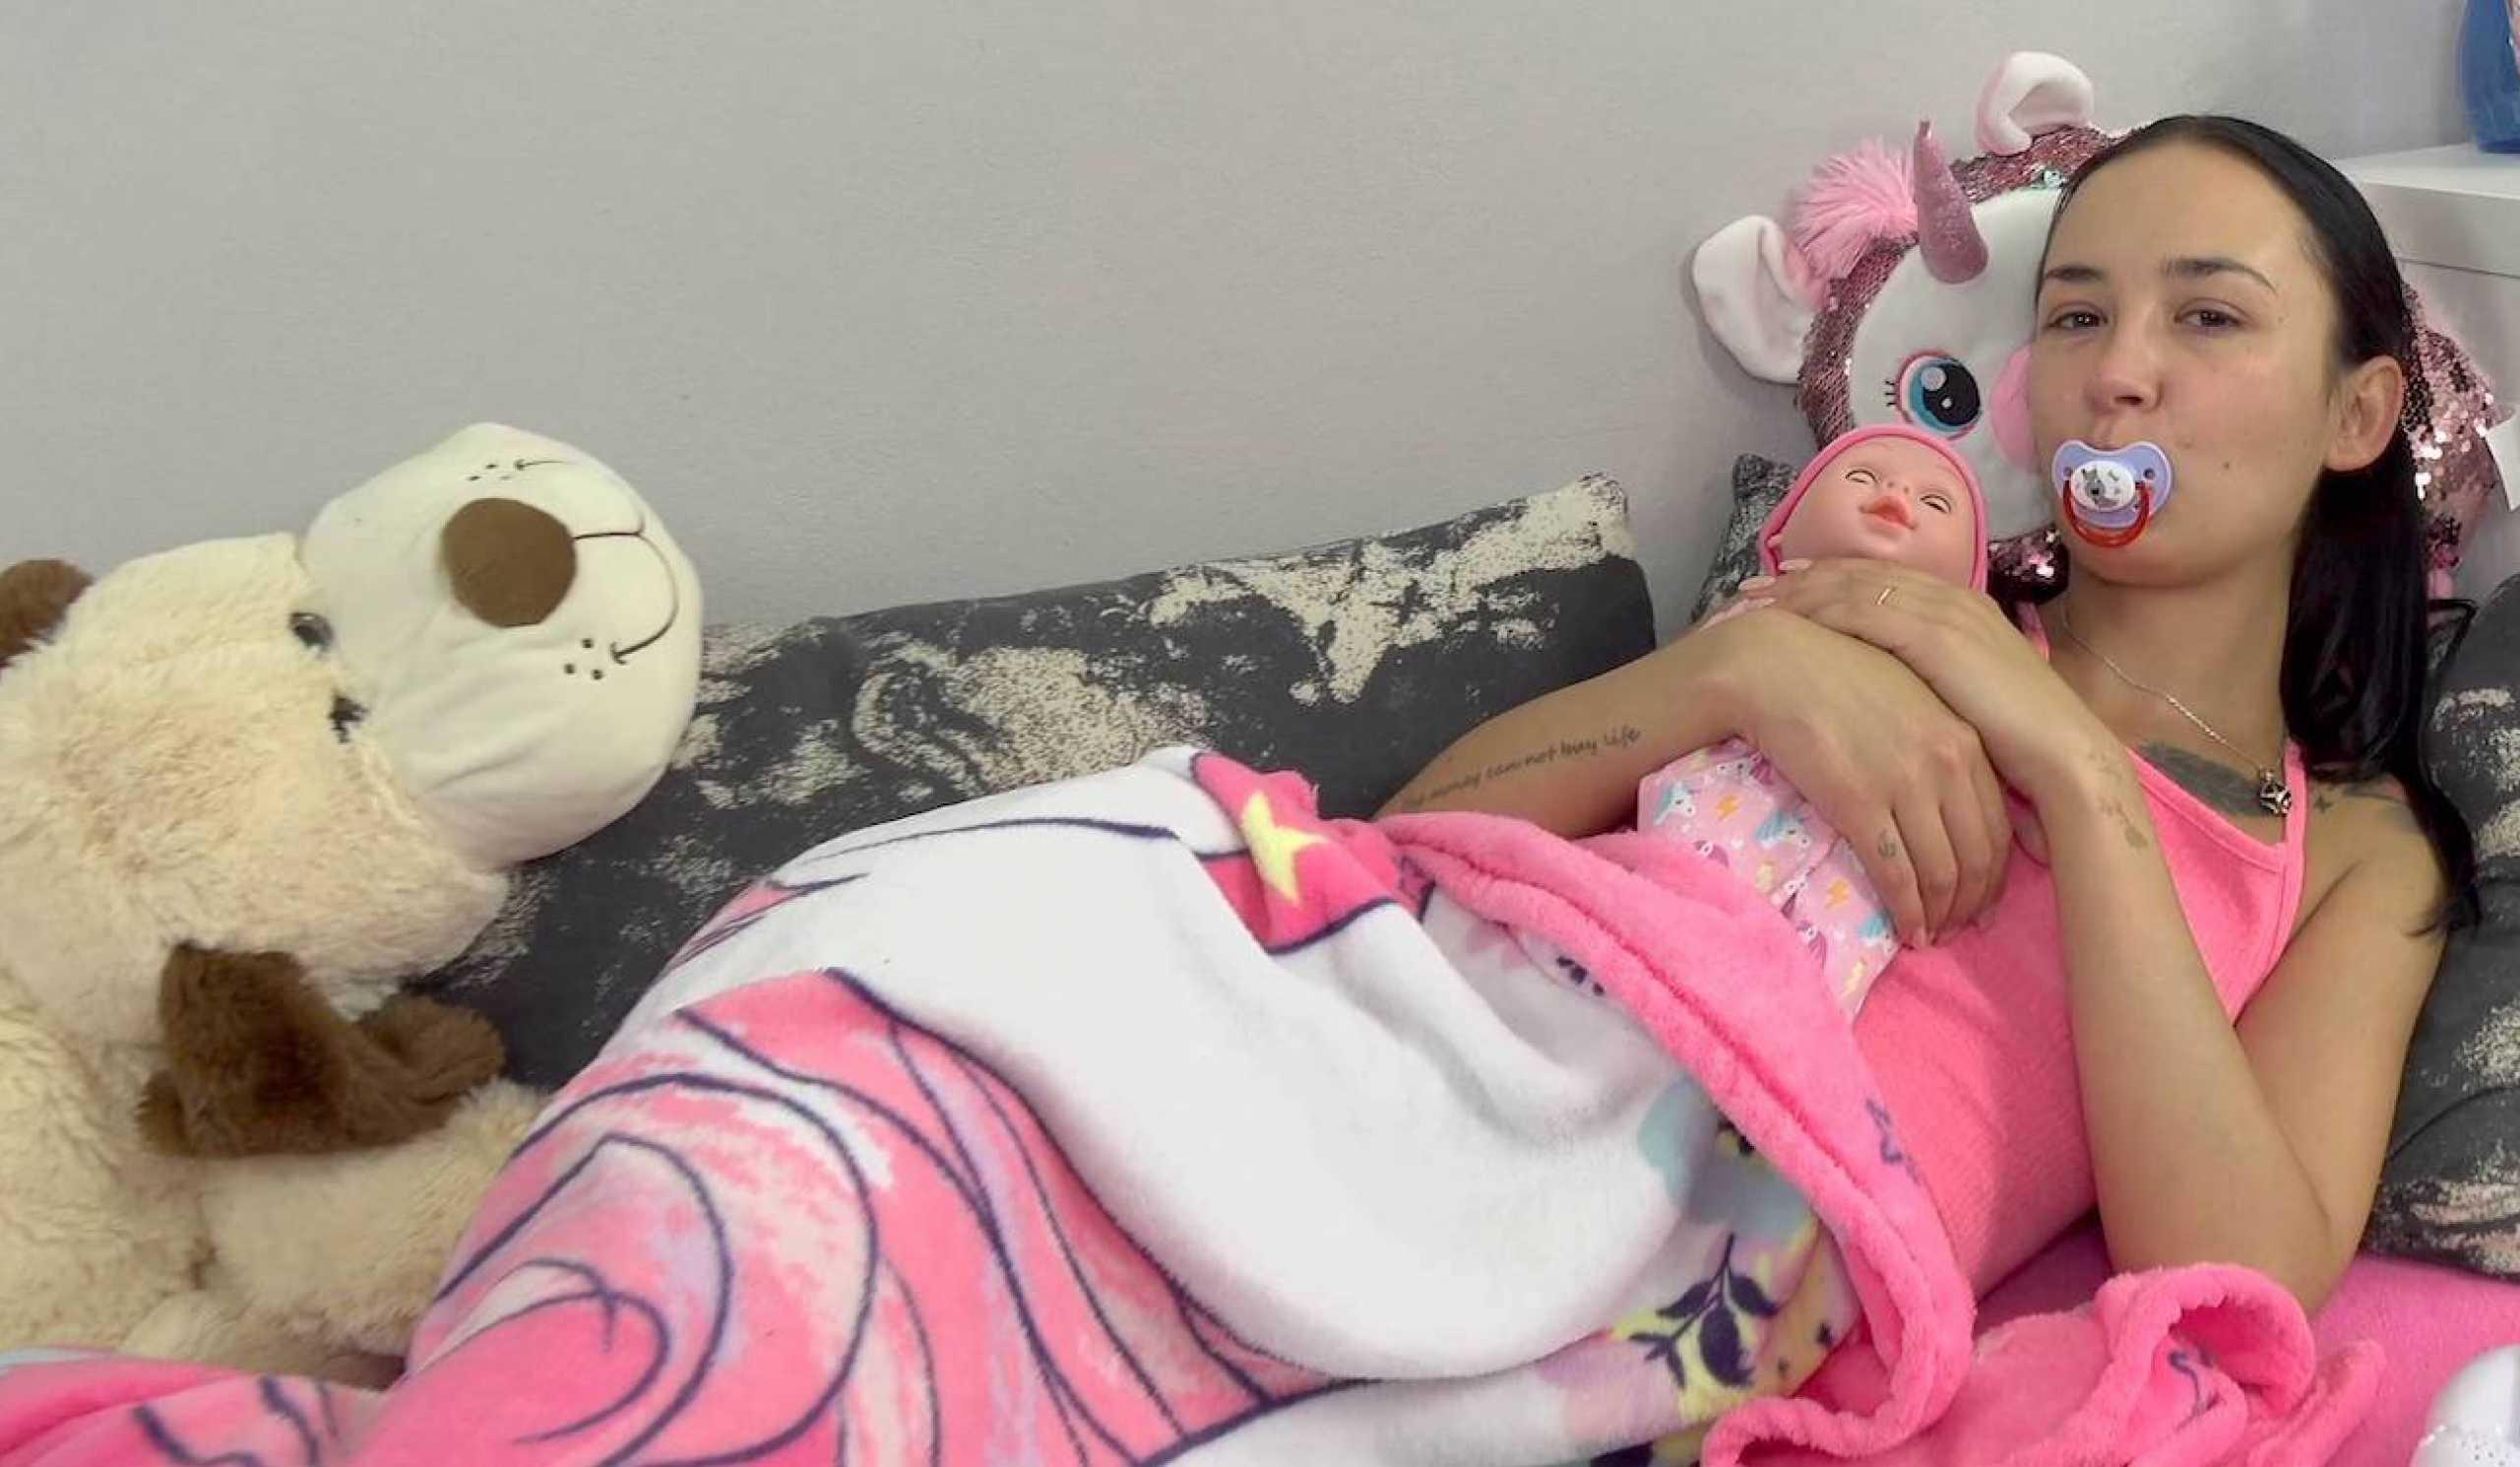 [CzechDeviant] Freya Dee (Girl In Pink Gets Pussy Stuffed Hard / 07.30.2020)